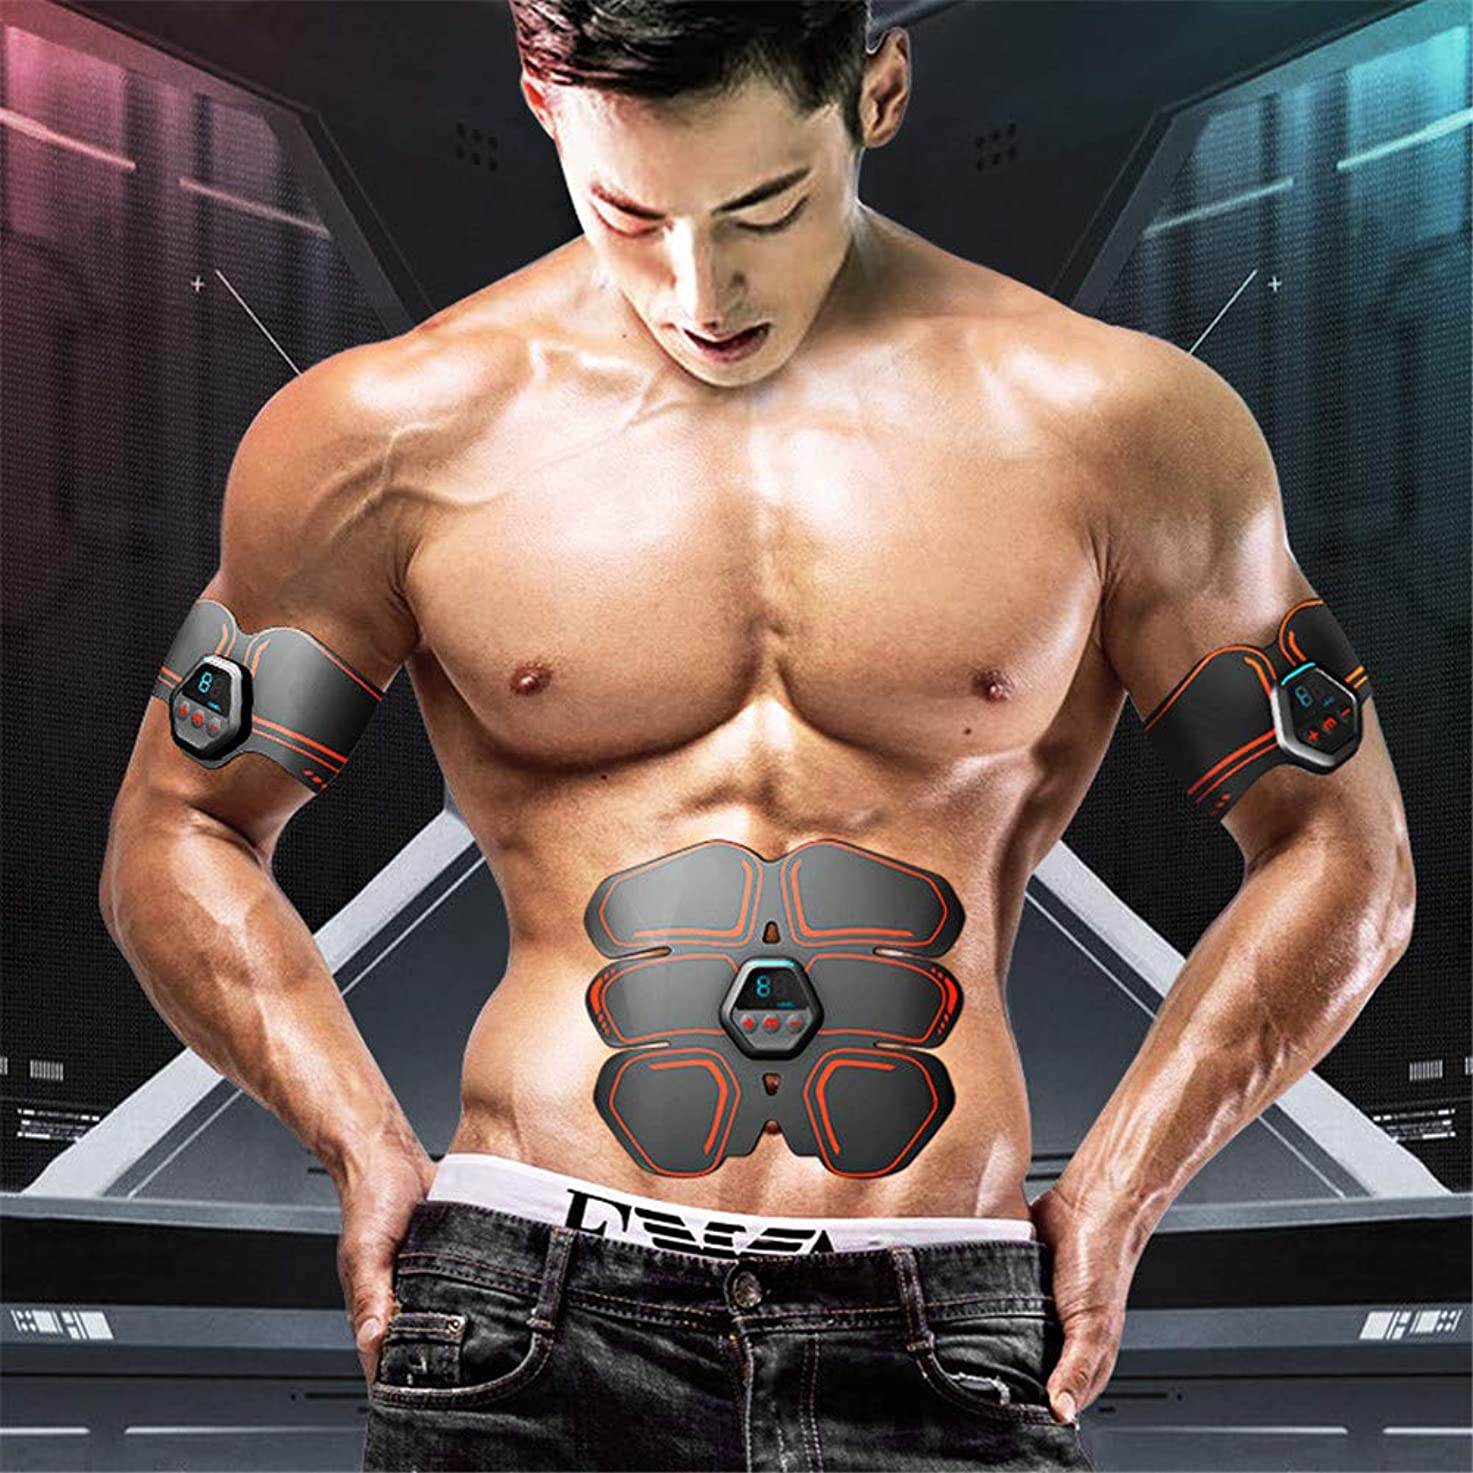 ABS振動筋肉刺激装置、EMS腹部刺激装置、電気筋肉マッサージ、腹部腕用USB充電腹部ベルト脚トレーニング,黒